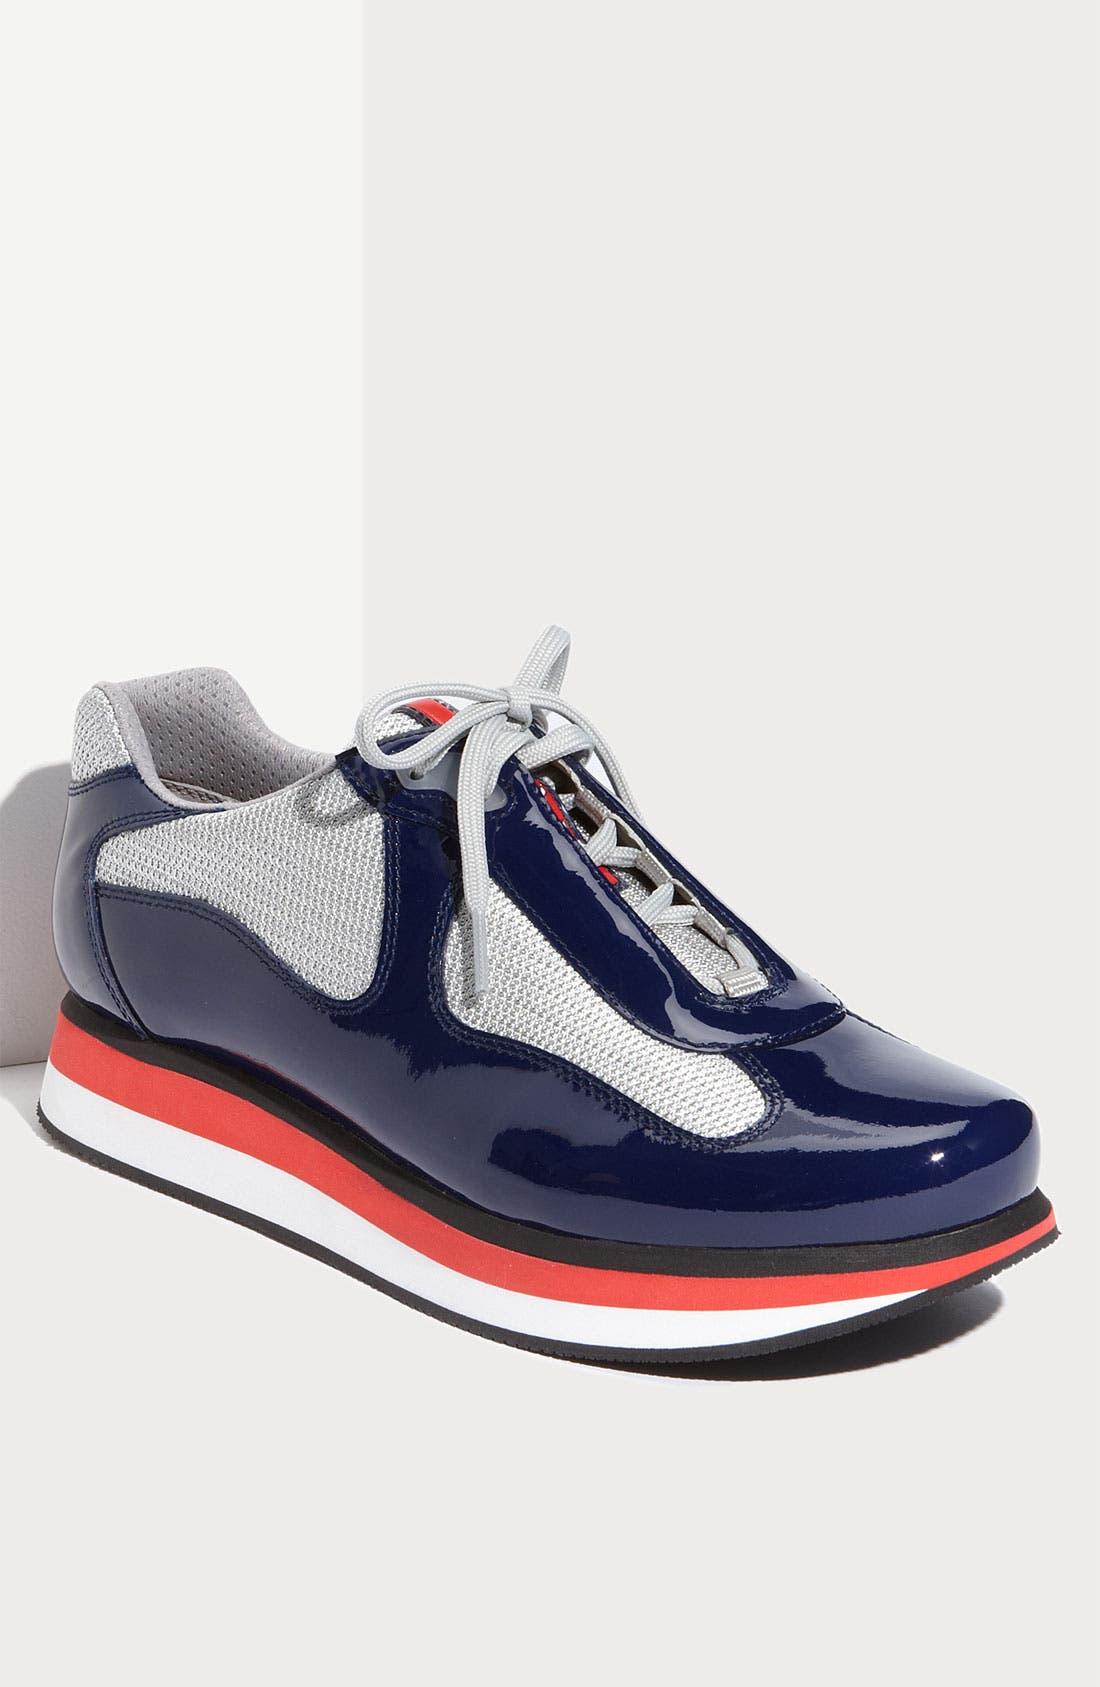 Alternate Image 1 Selected - Prada 'Punta Ala' Double Sole Sneaker